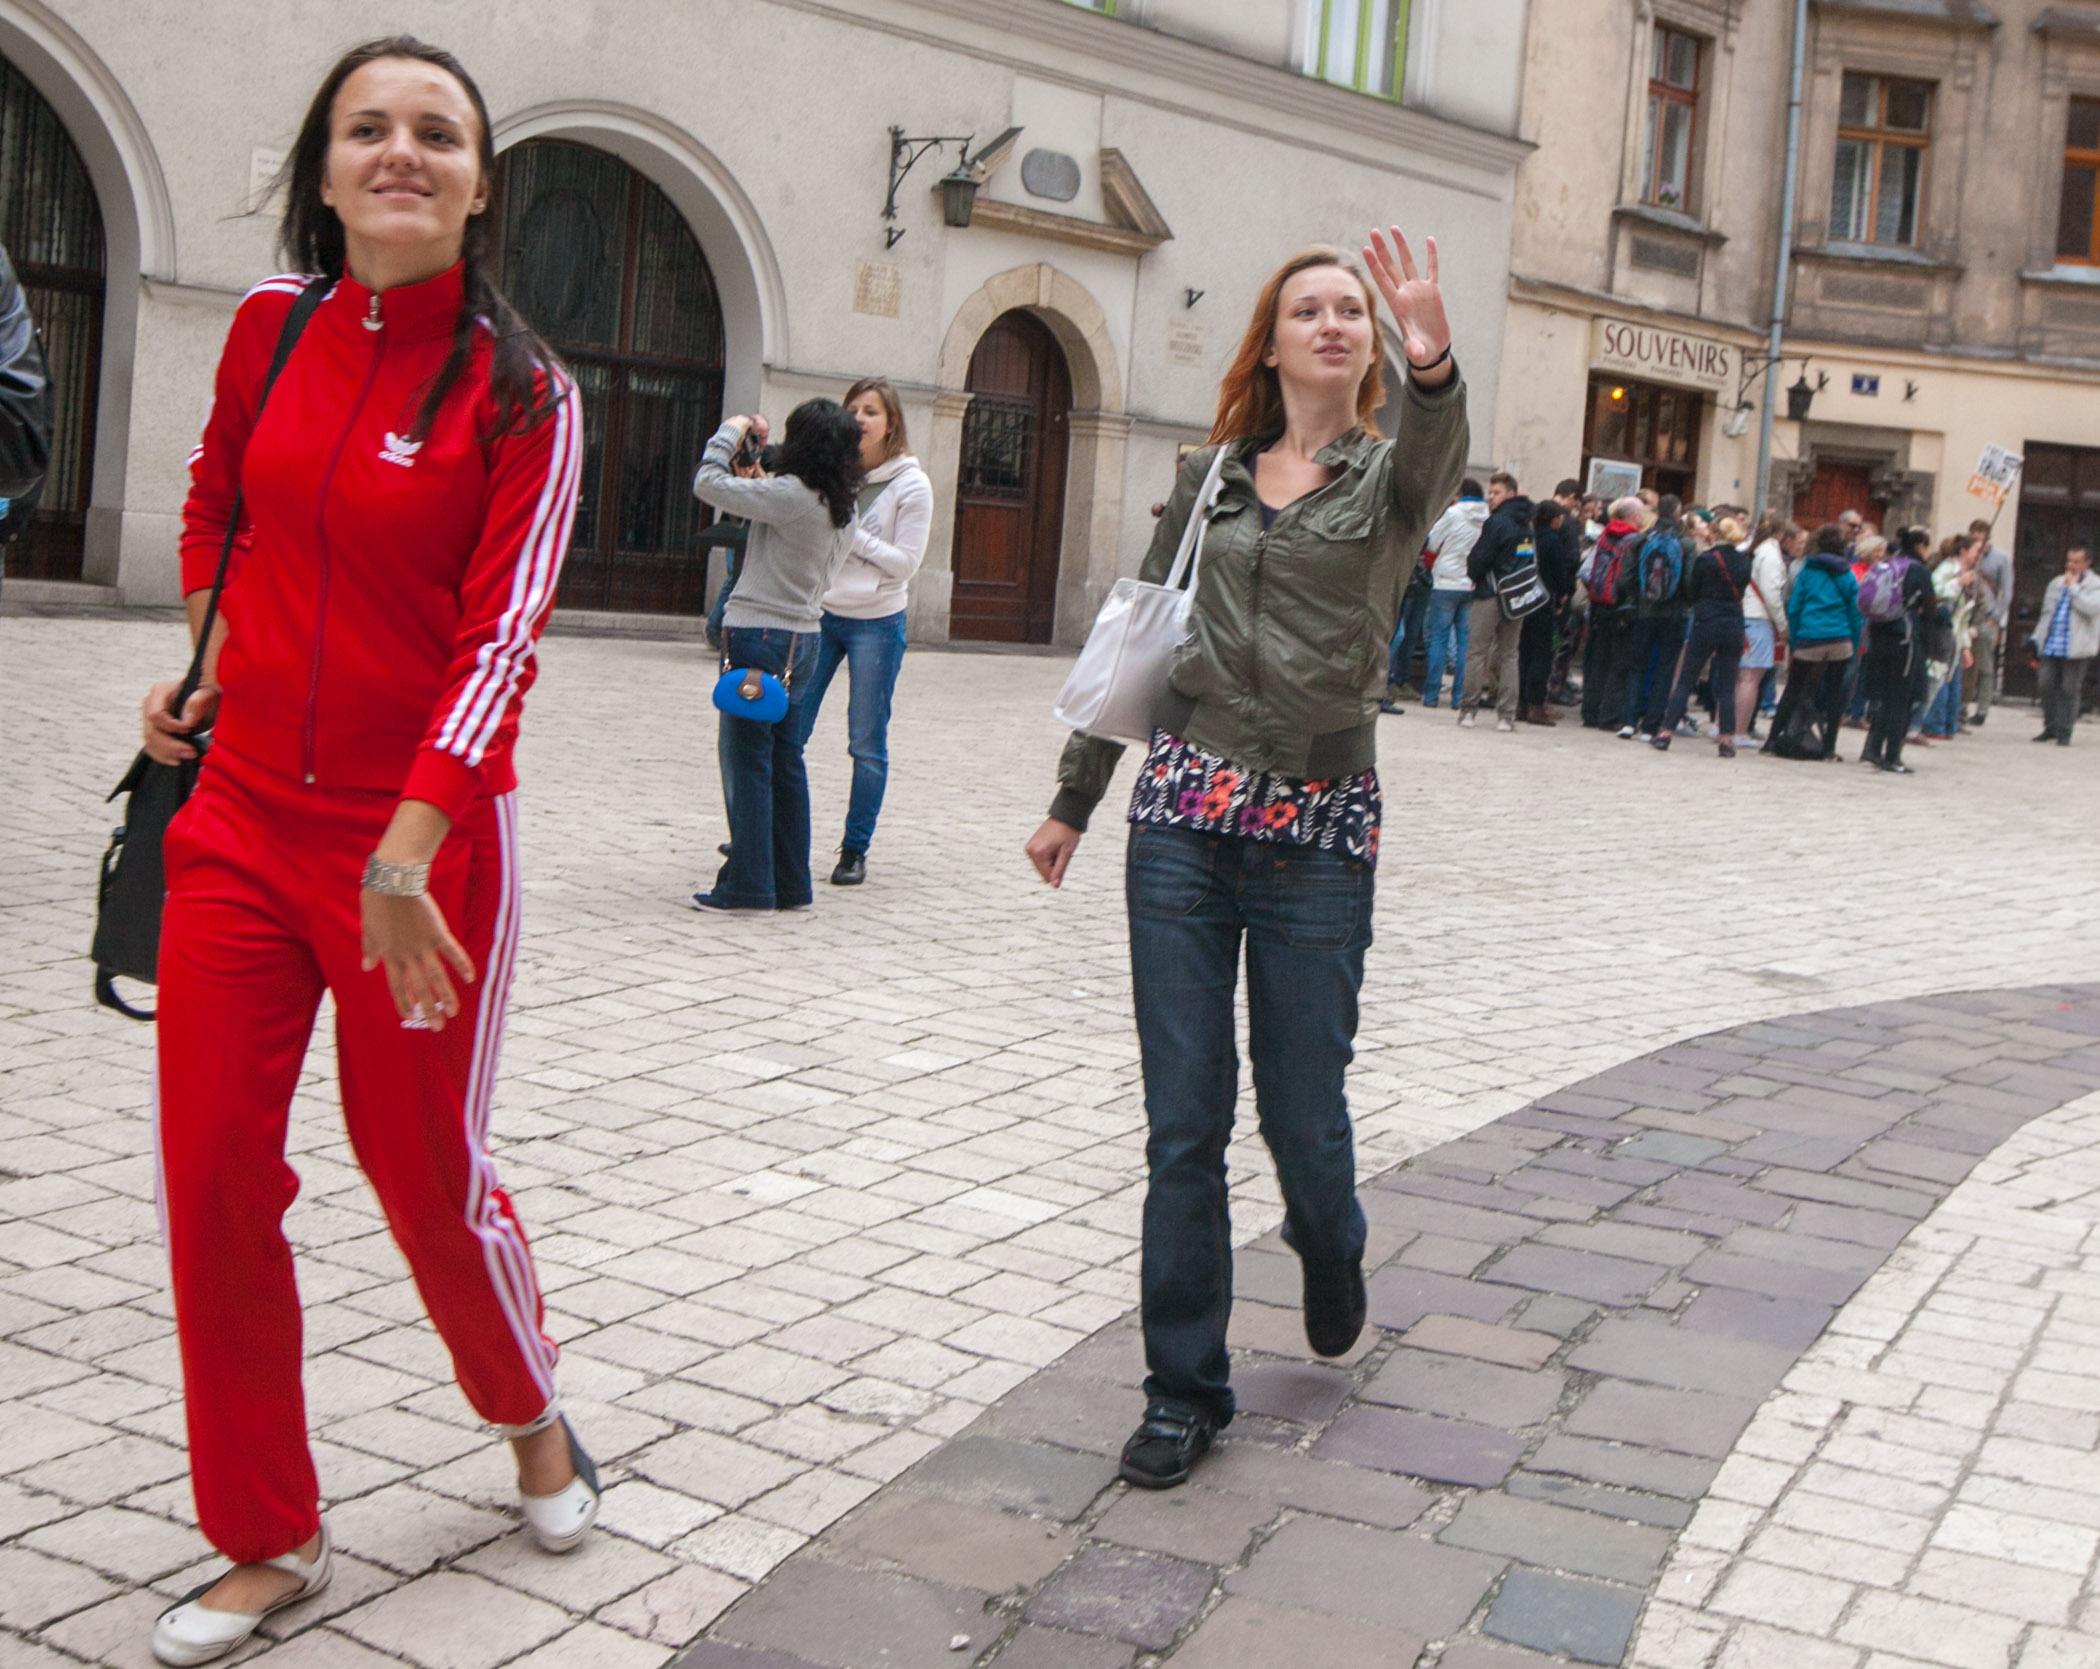 Visitors at Krakow Main Square